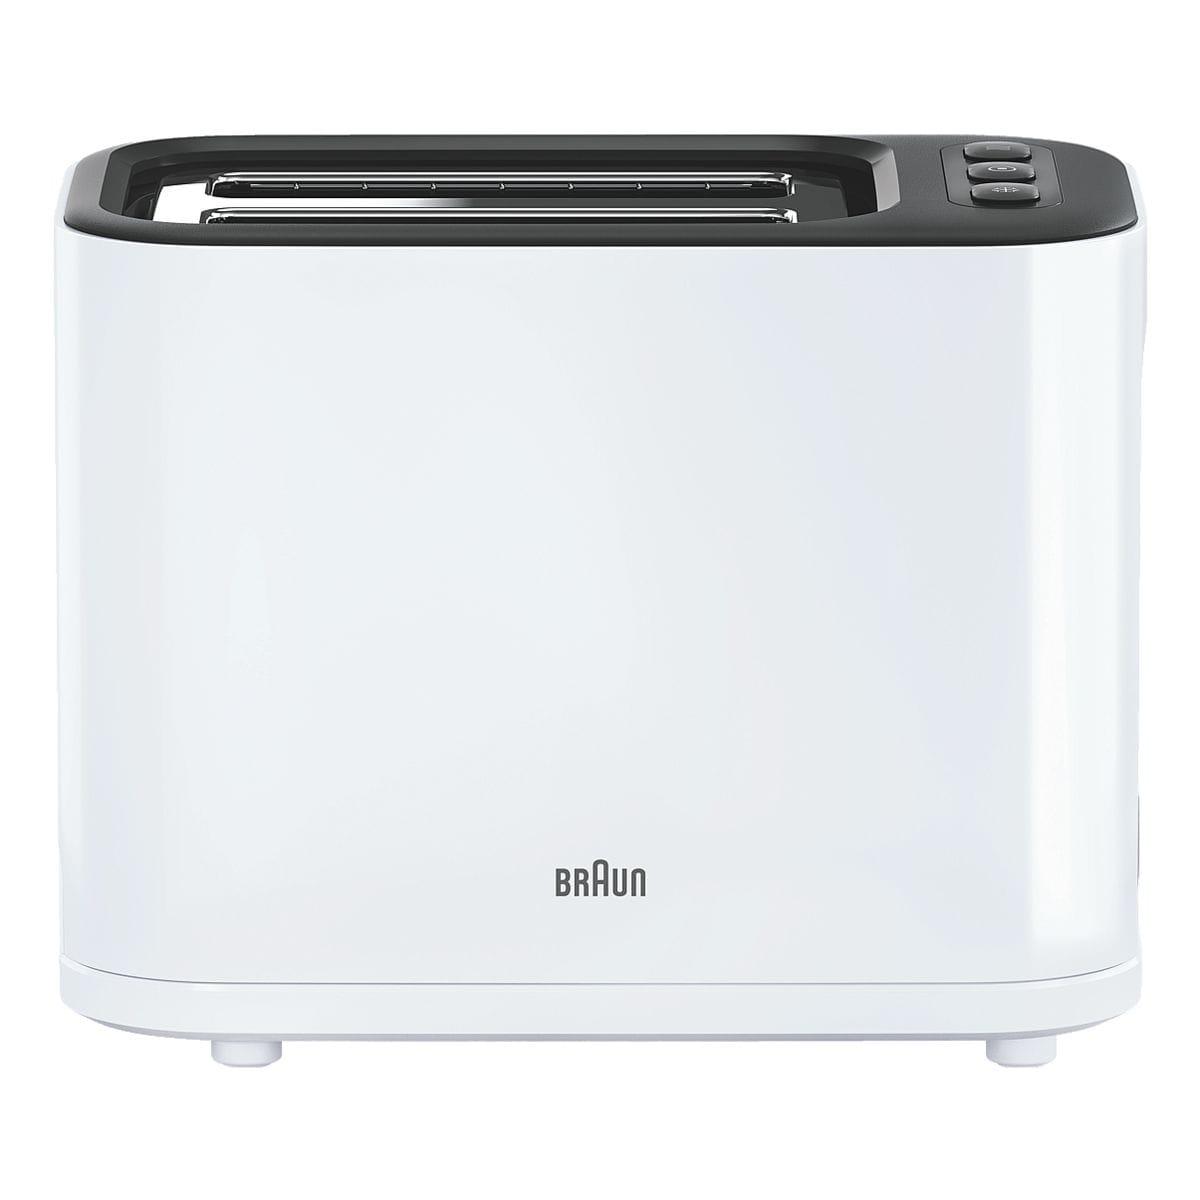 BRAUN Toaster »PurEase HT 3010 WH«